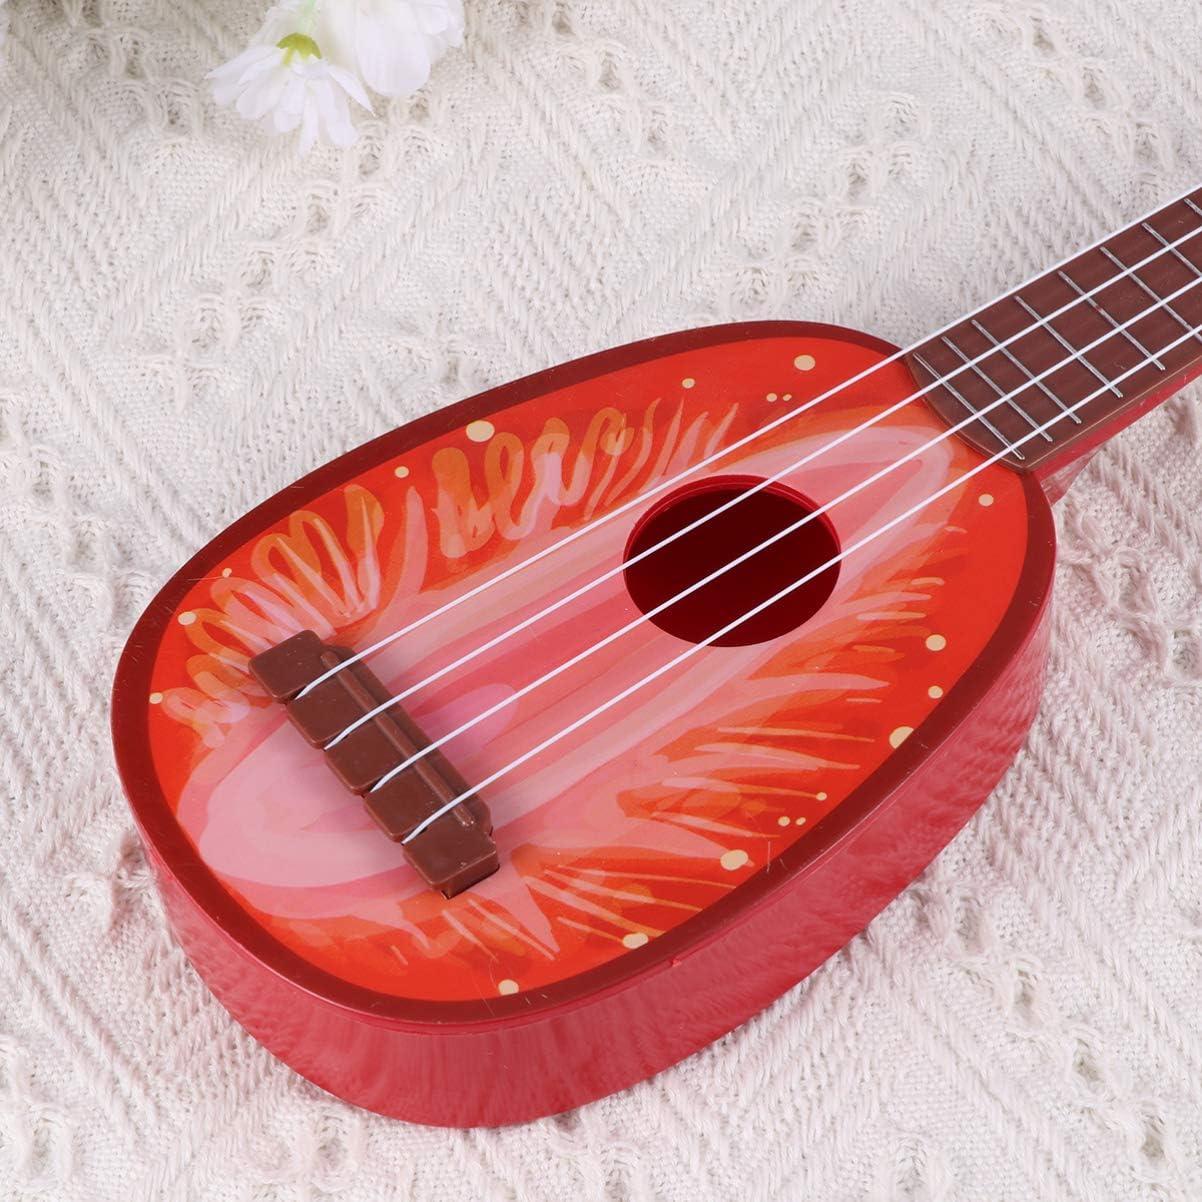 HEALLILY Kiwi Forma Carina Frutta Ukulele Chitarra Giocattolo per Bambini Giocattolo per Bambini Chitarra per Bambini Giocattolo per Bambini Chitarra Verde Taglia L